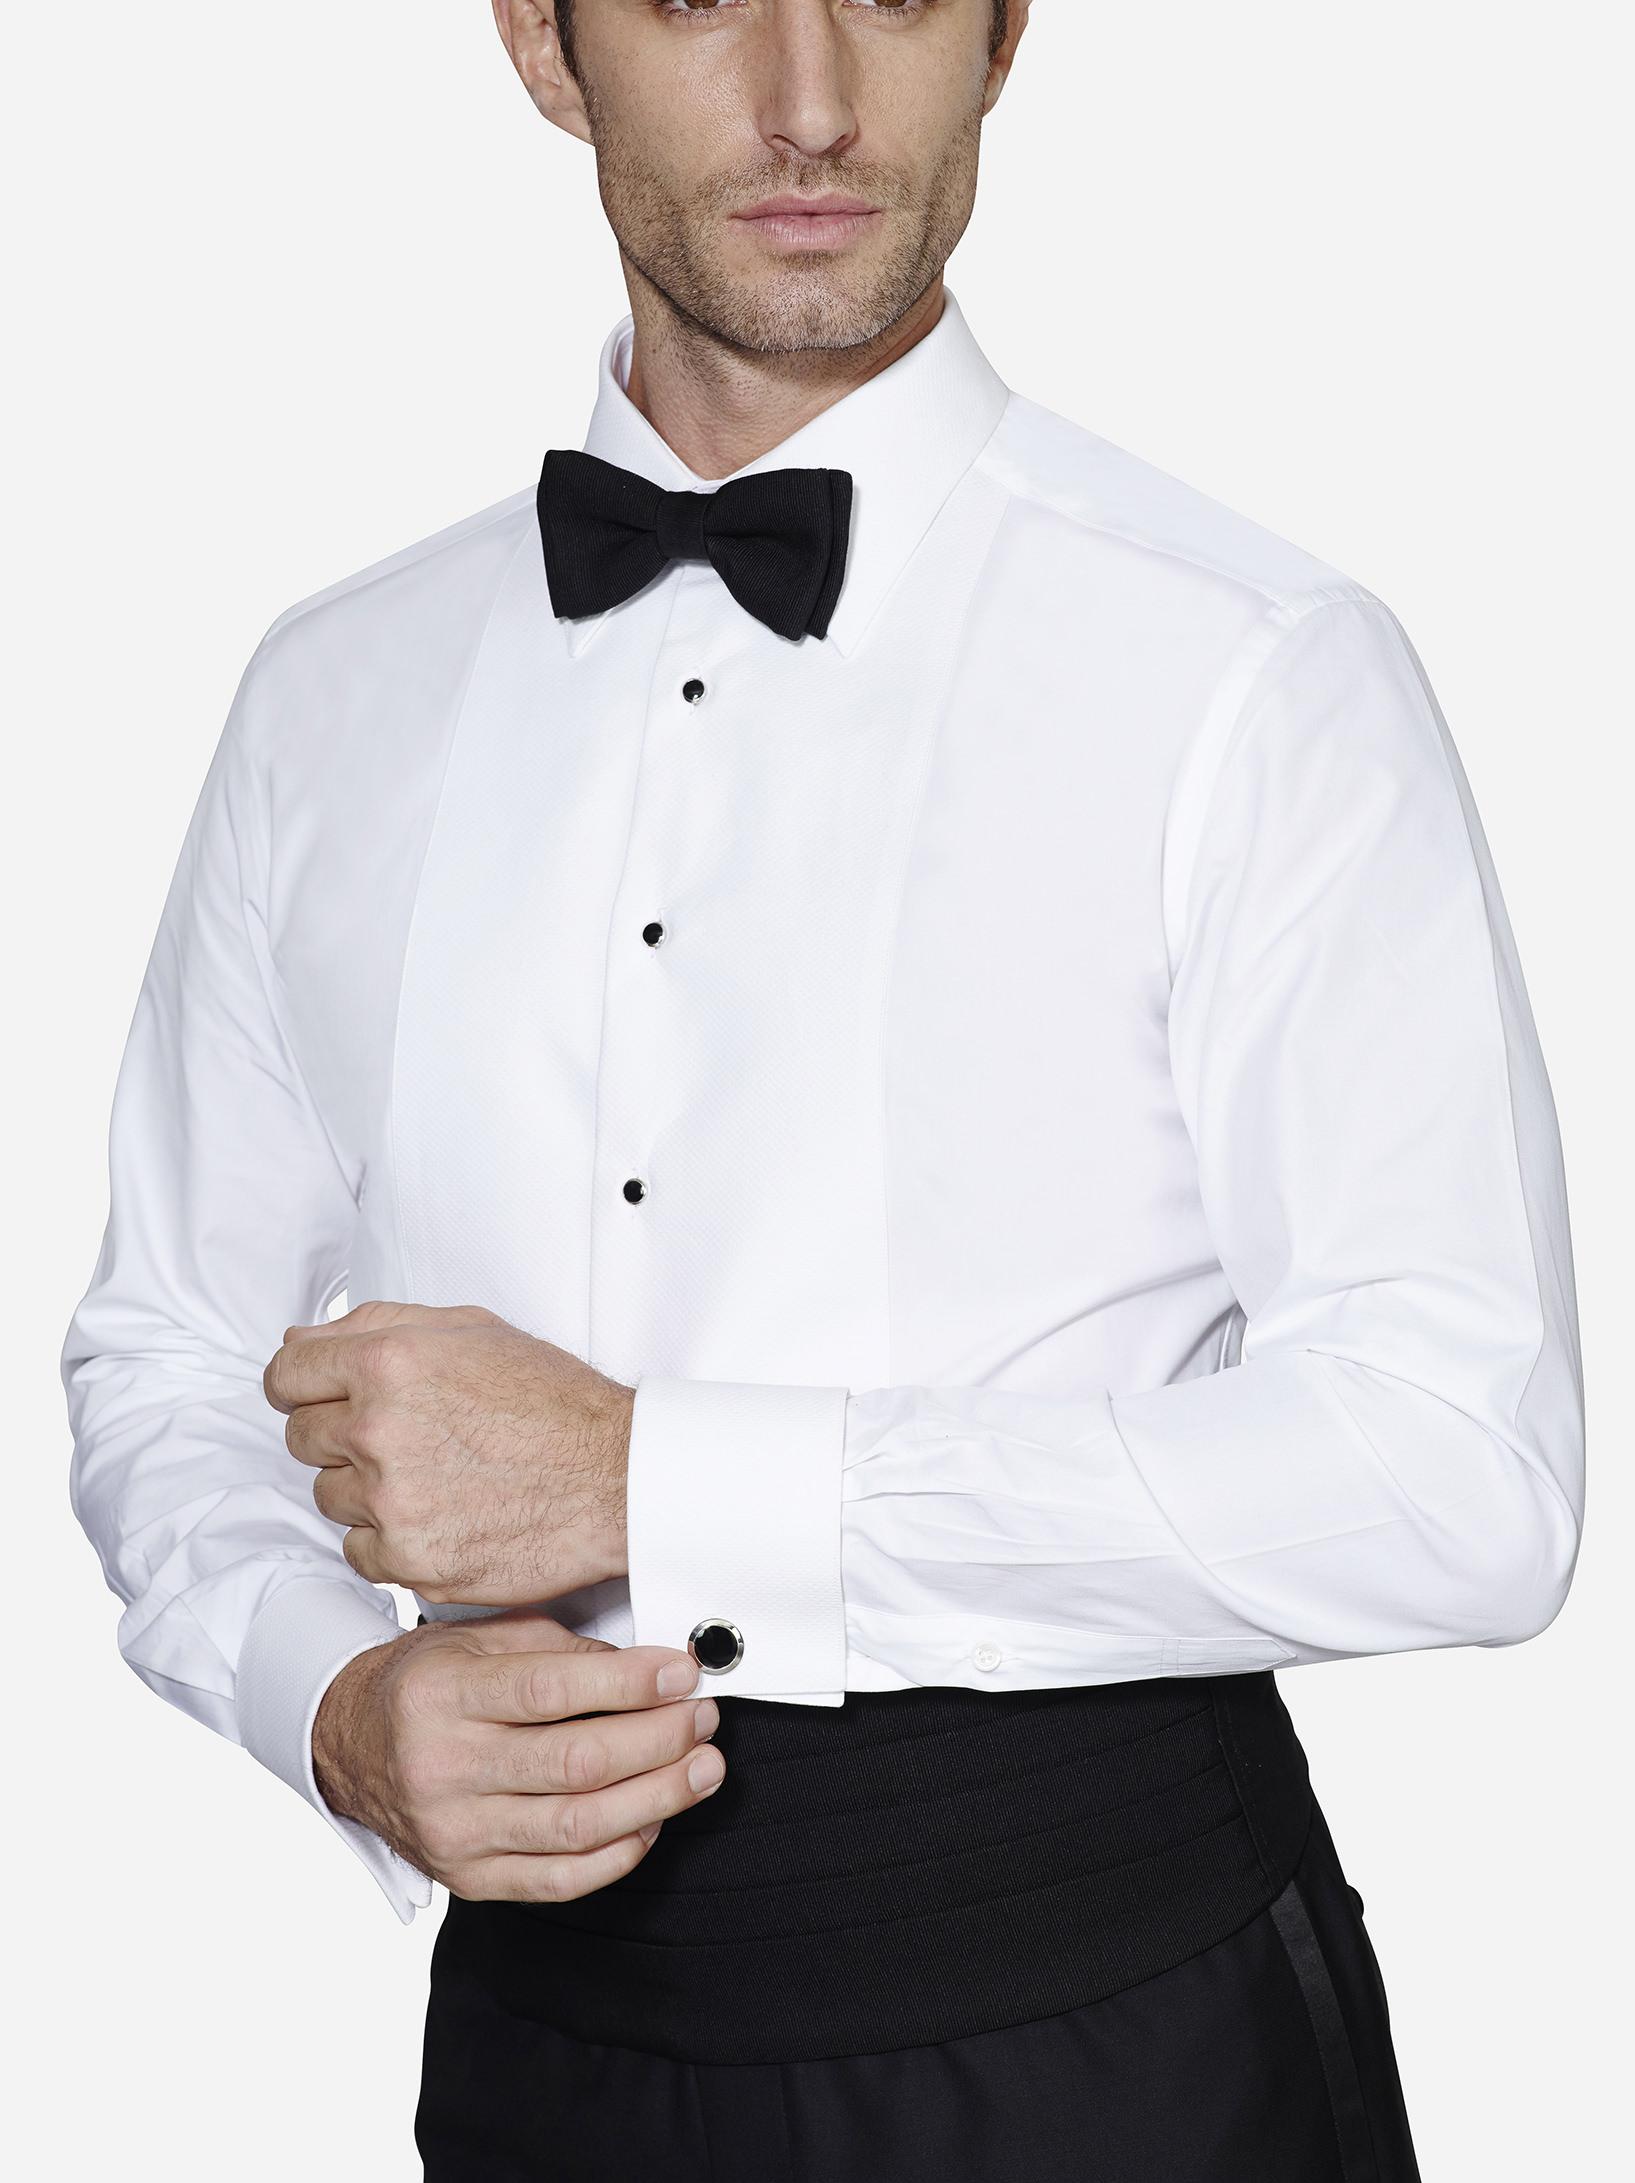 Bib Front with Diamond Pique tuxedo shirt